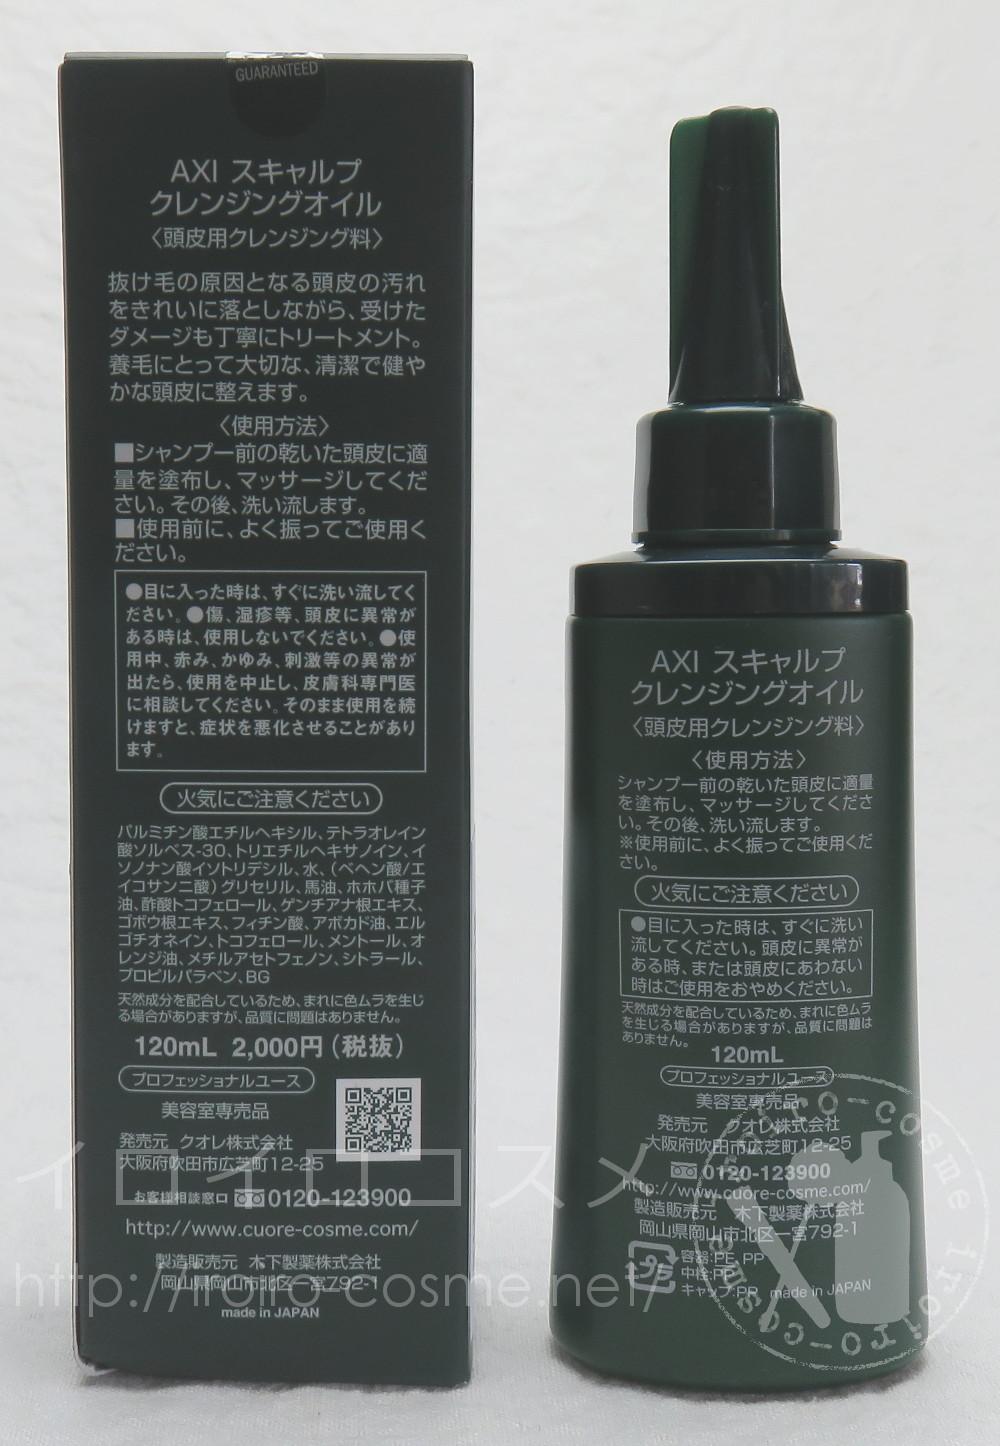 AXI スキャルプ クレンジングオイル 120ml 頭皮用クレンジング料 口コミ・レビュー 使用方法